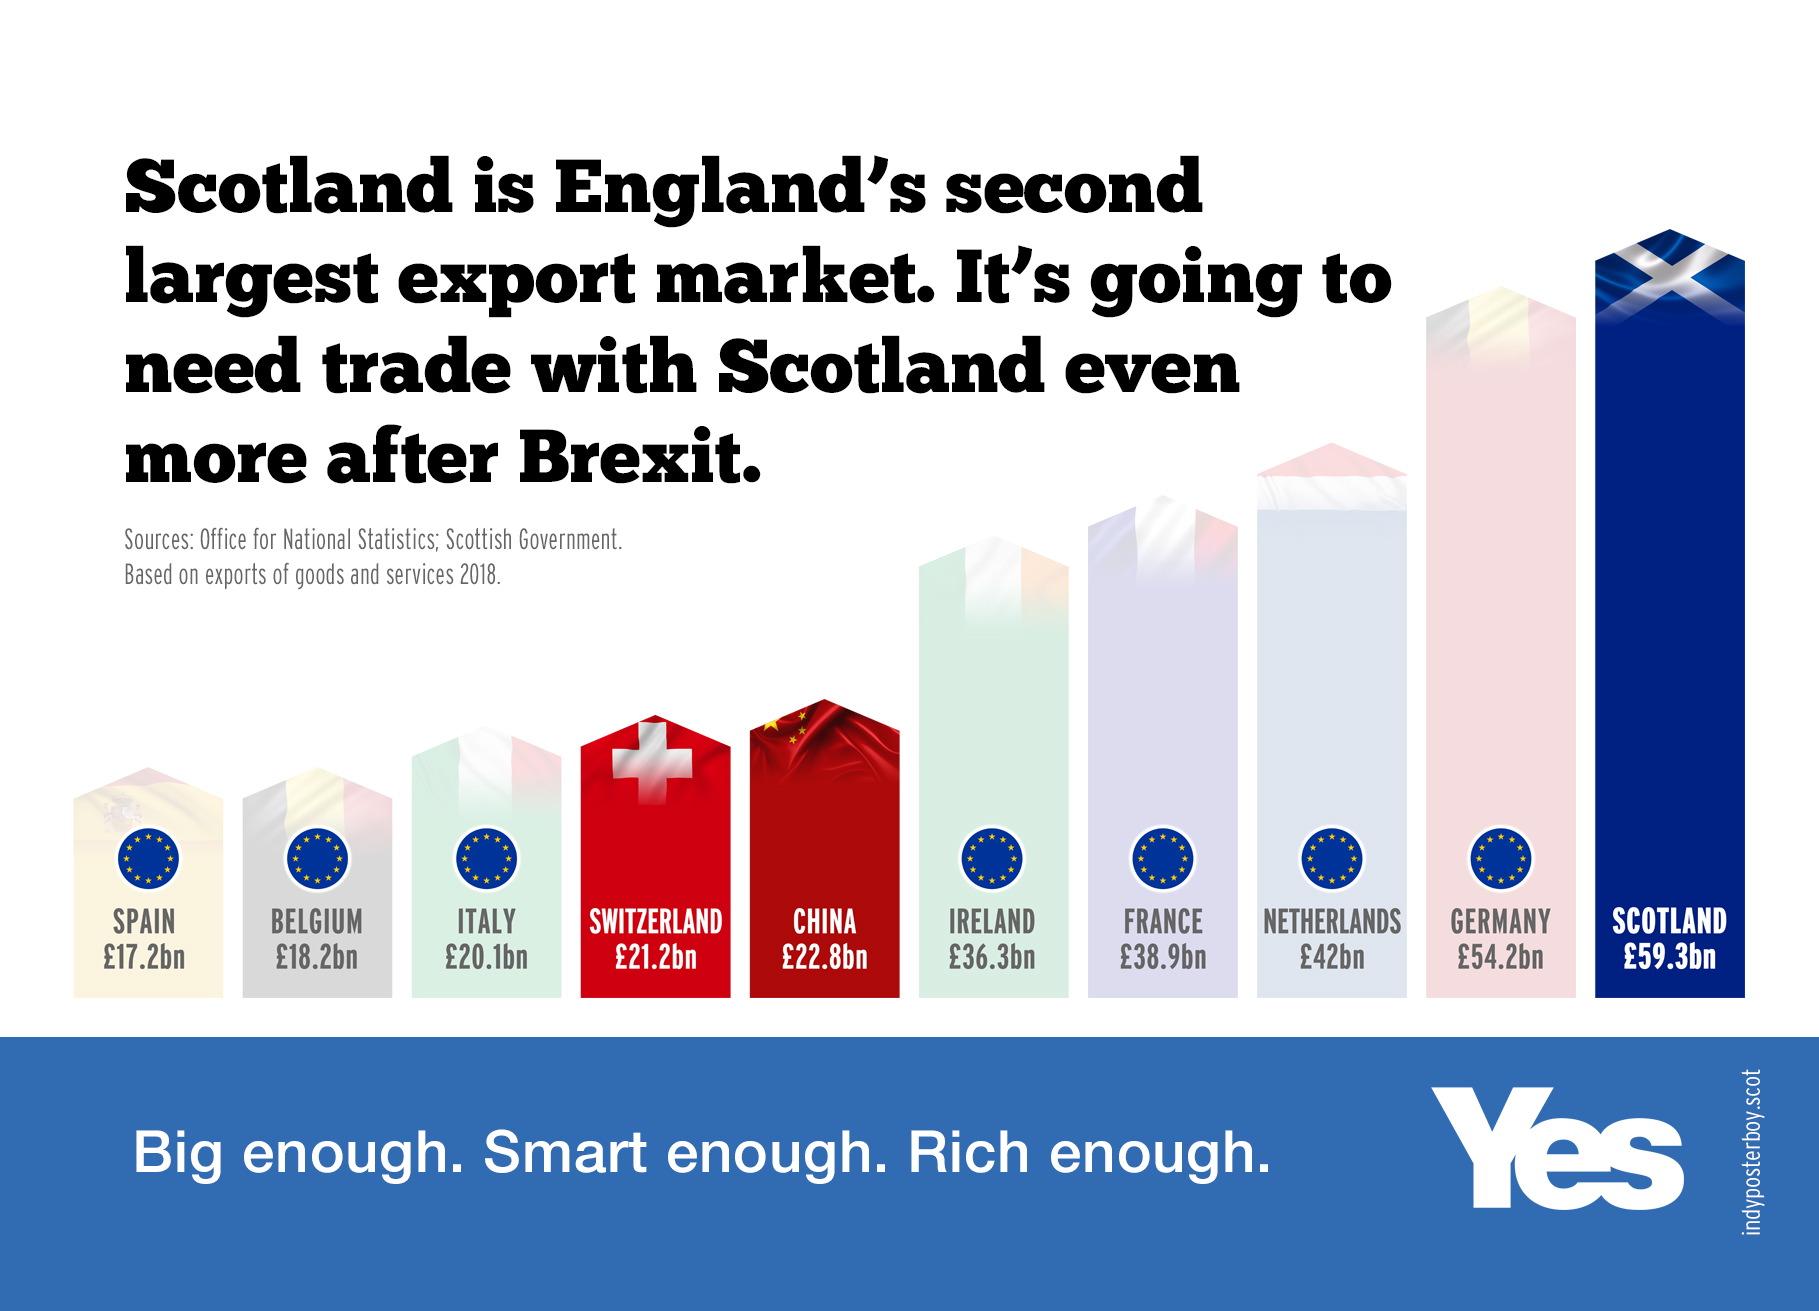 England needs Scotland's resources